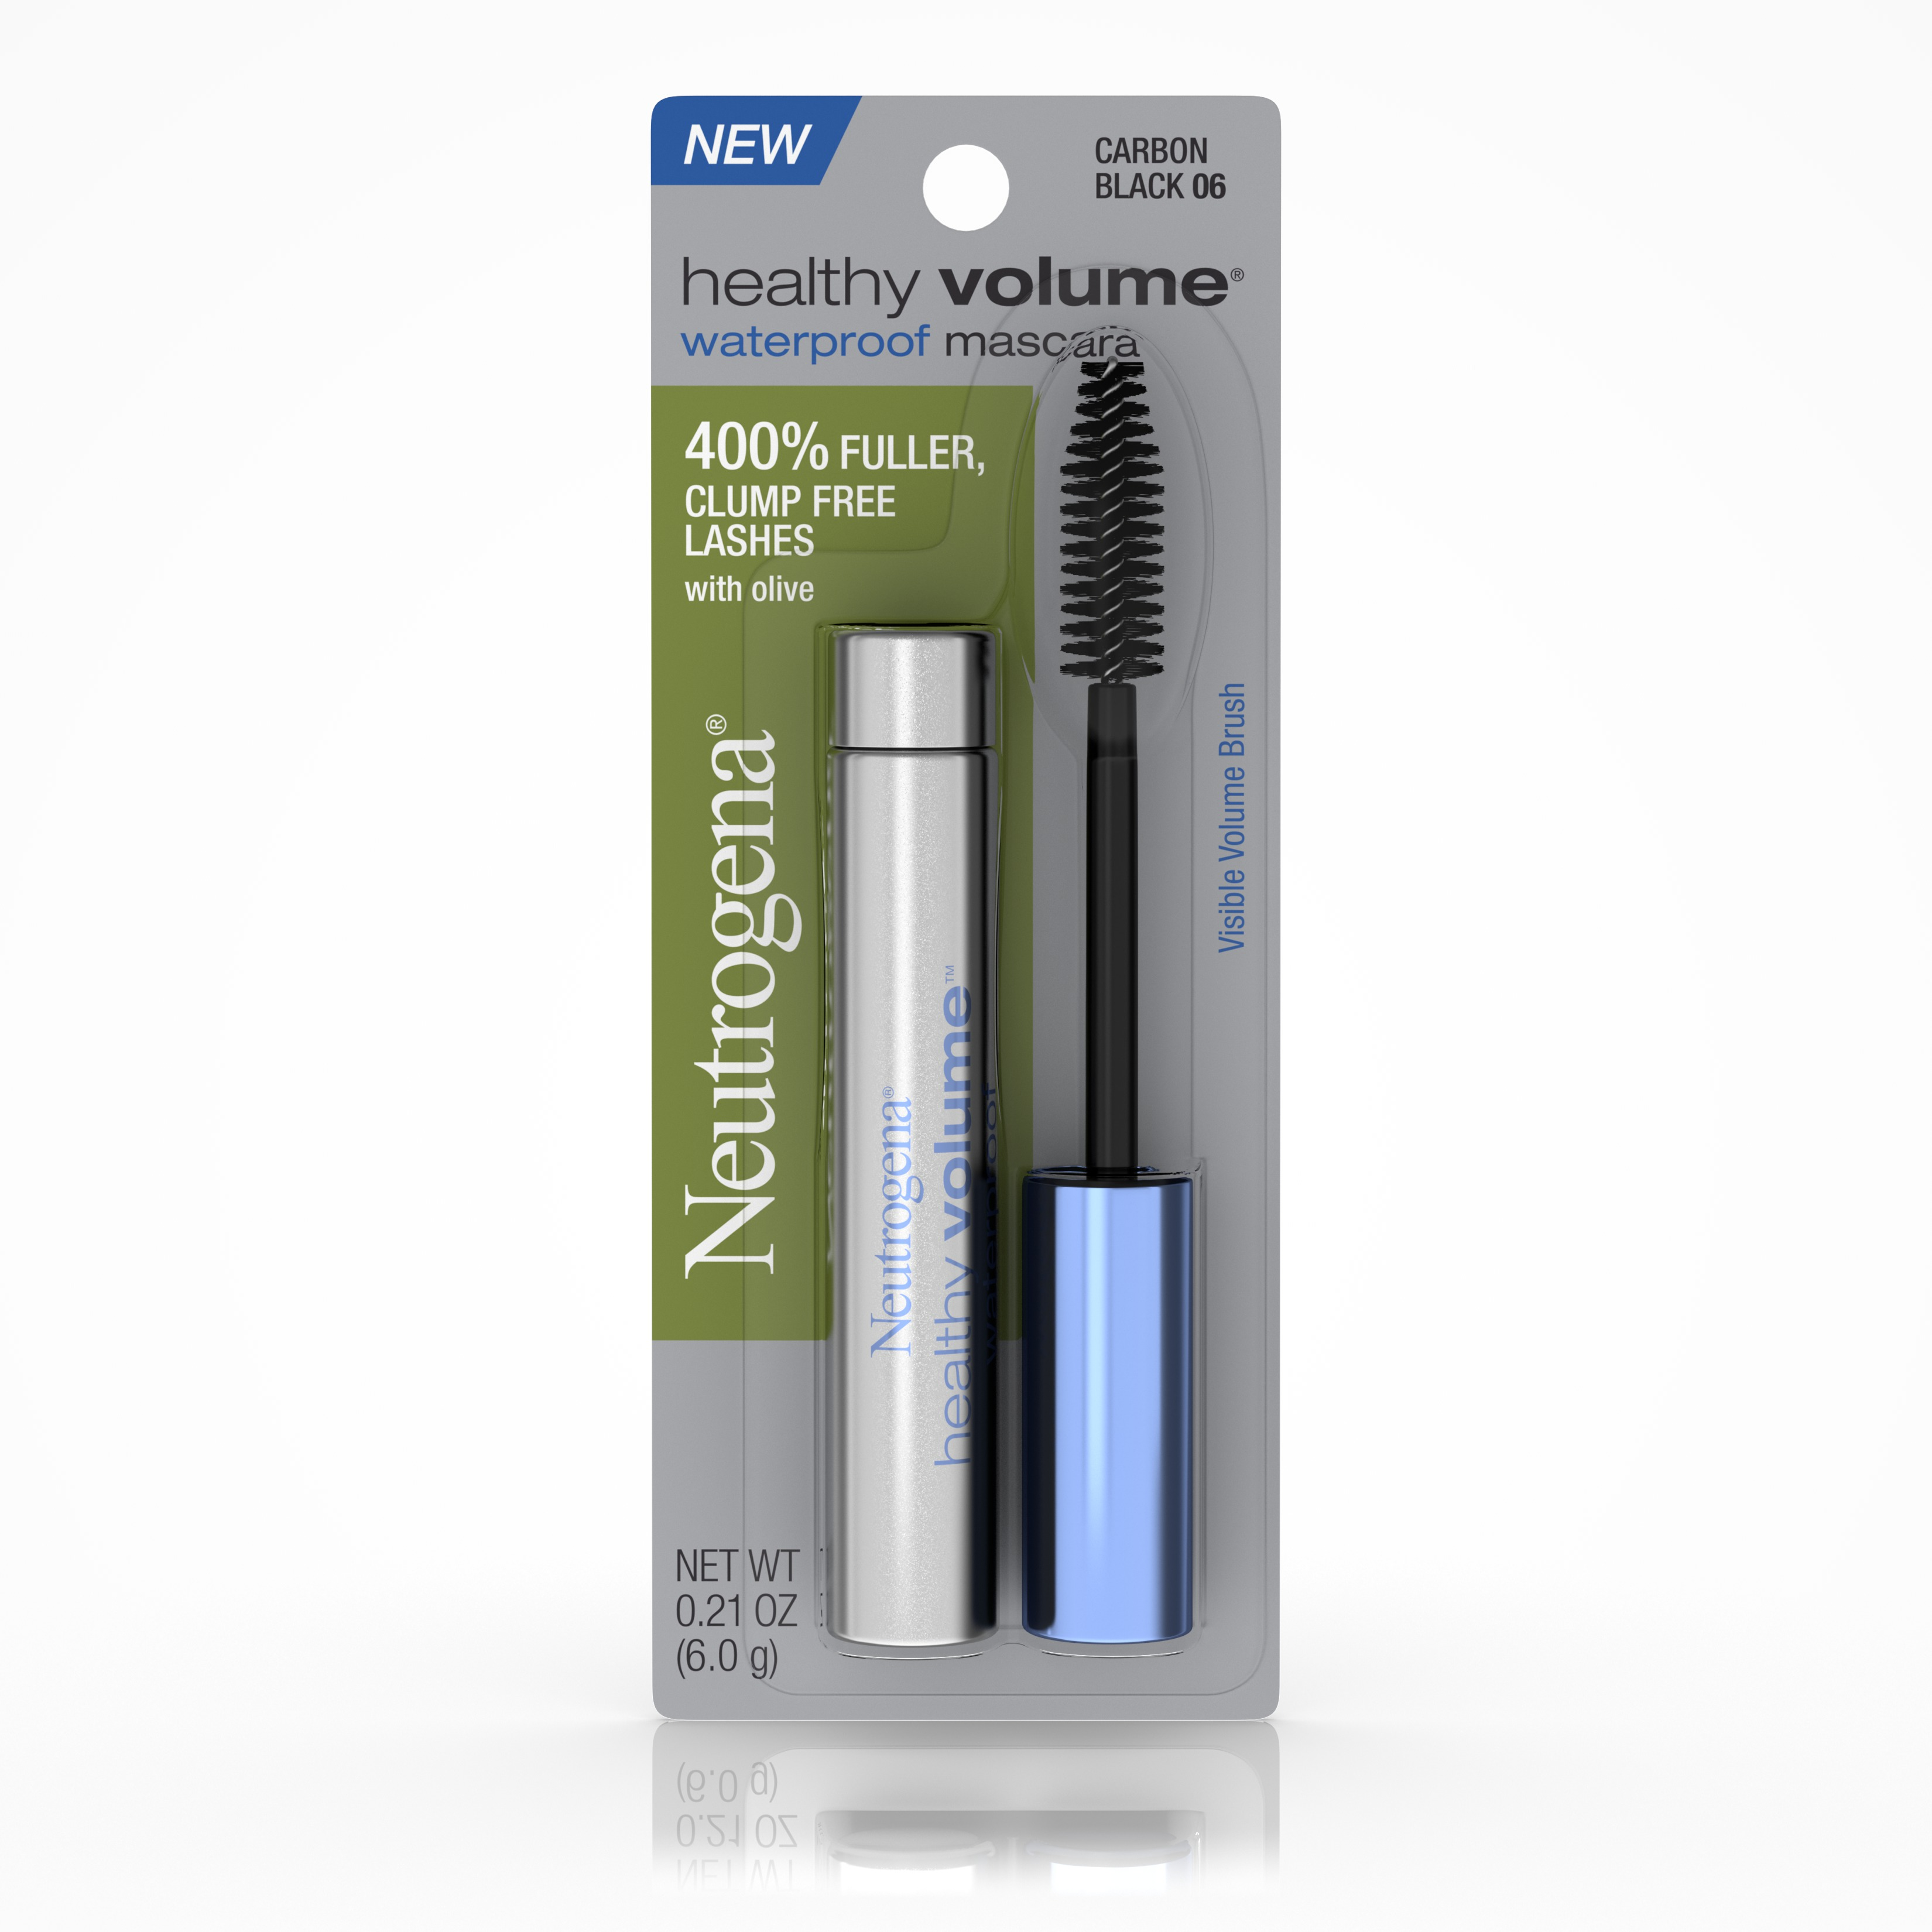 Neutrogena Healthy Volume Waterproof Mascara, Carbon Black 06, .21 Oz - Walmart.com